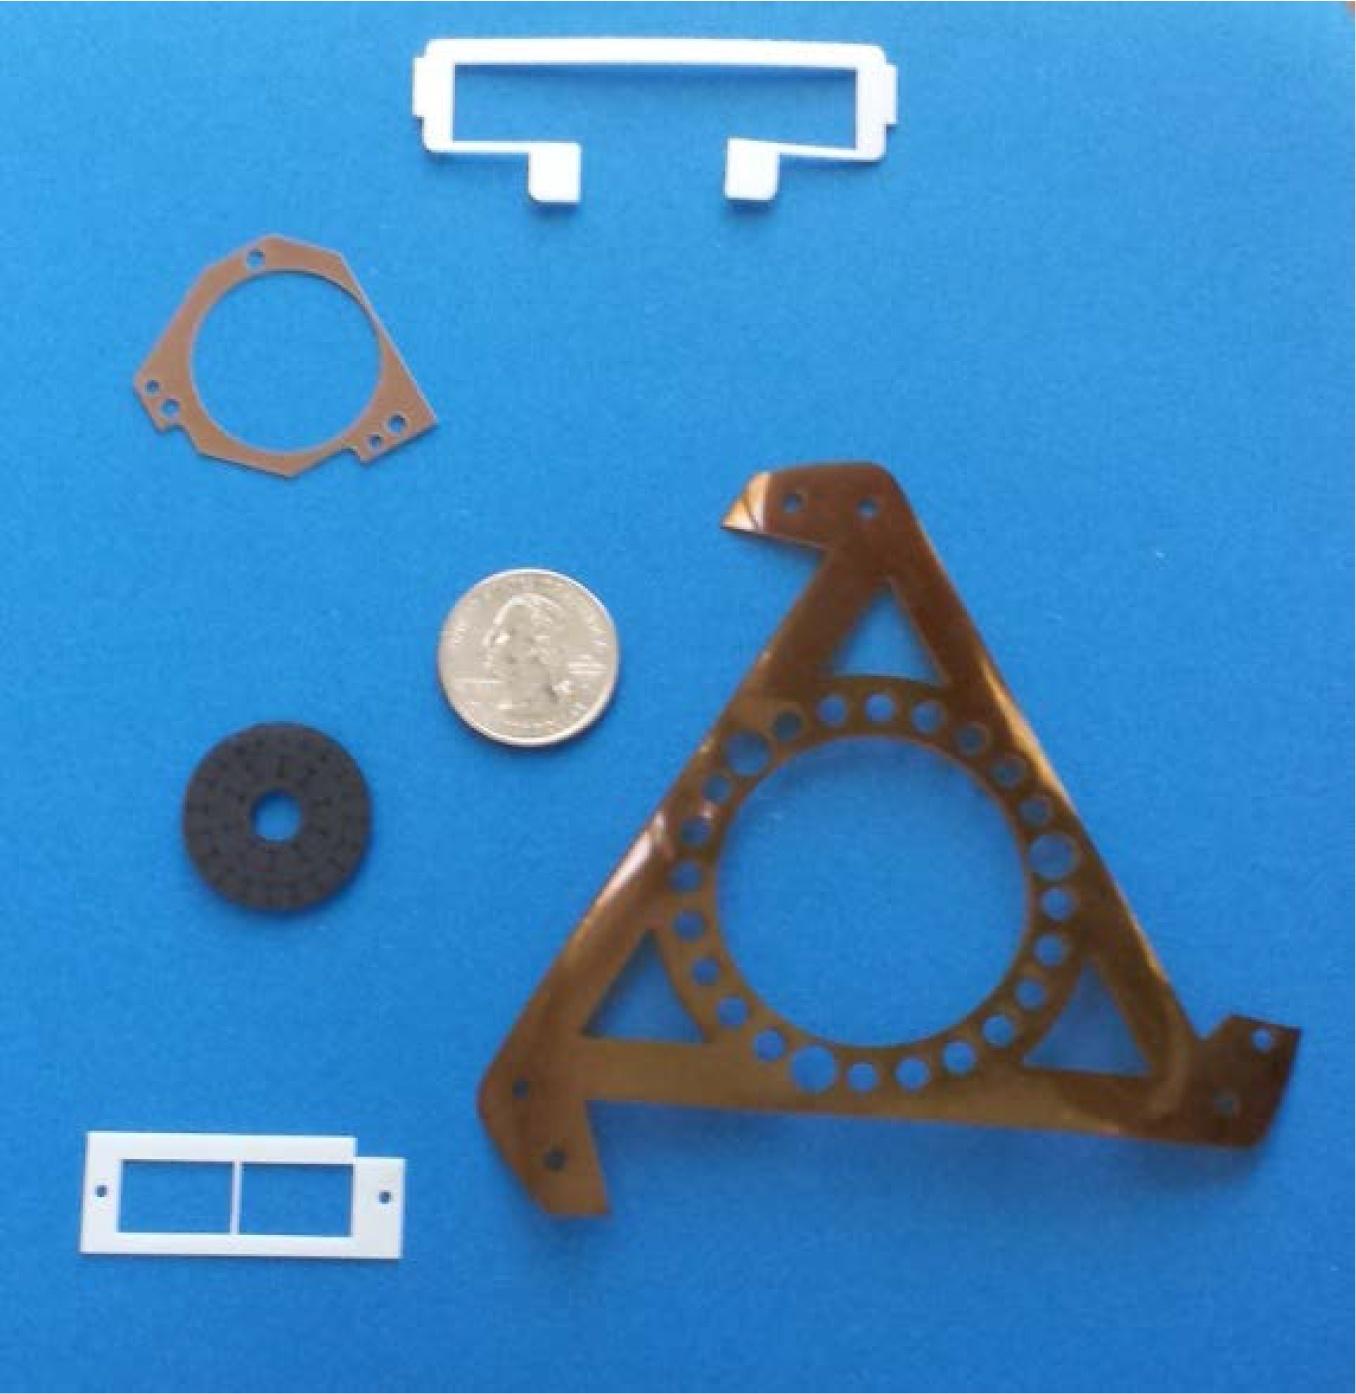 Made-in-California-manufacturer-Rache-NonMetalCuttingExamples-X1